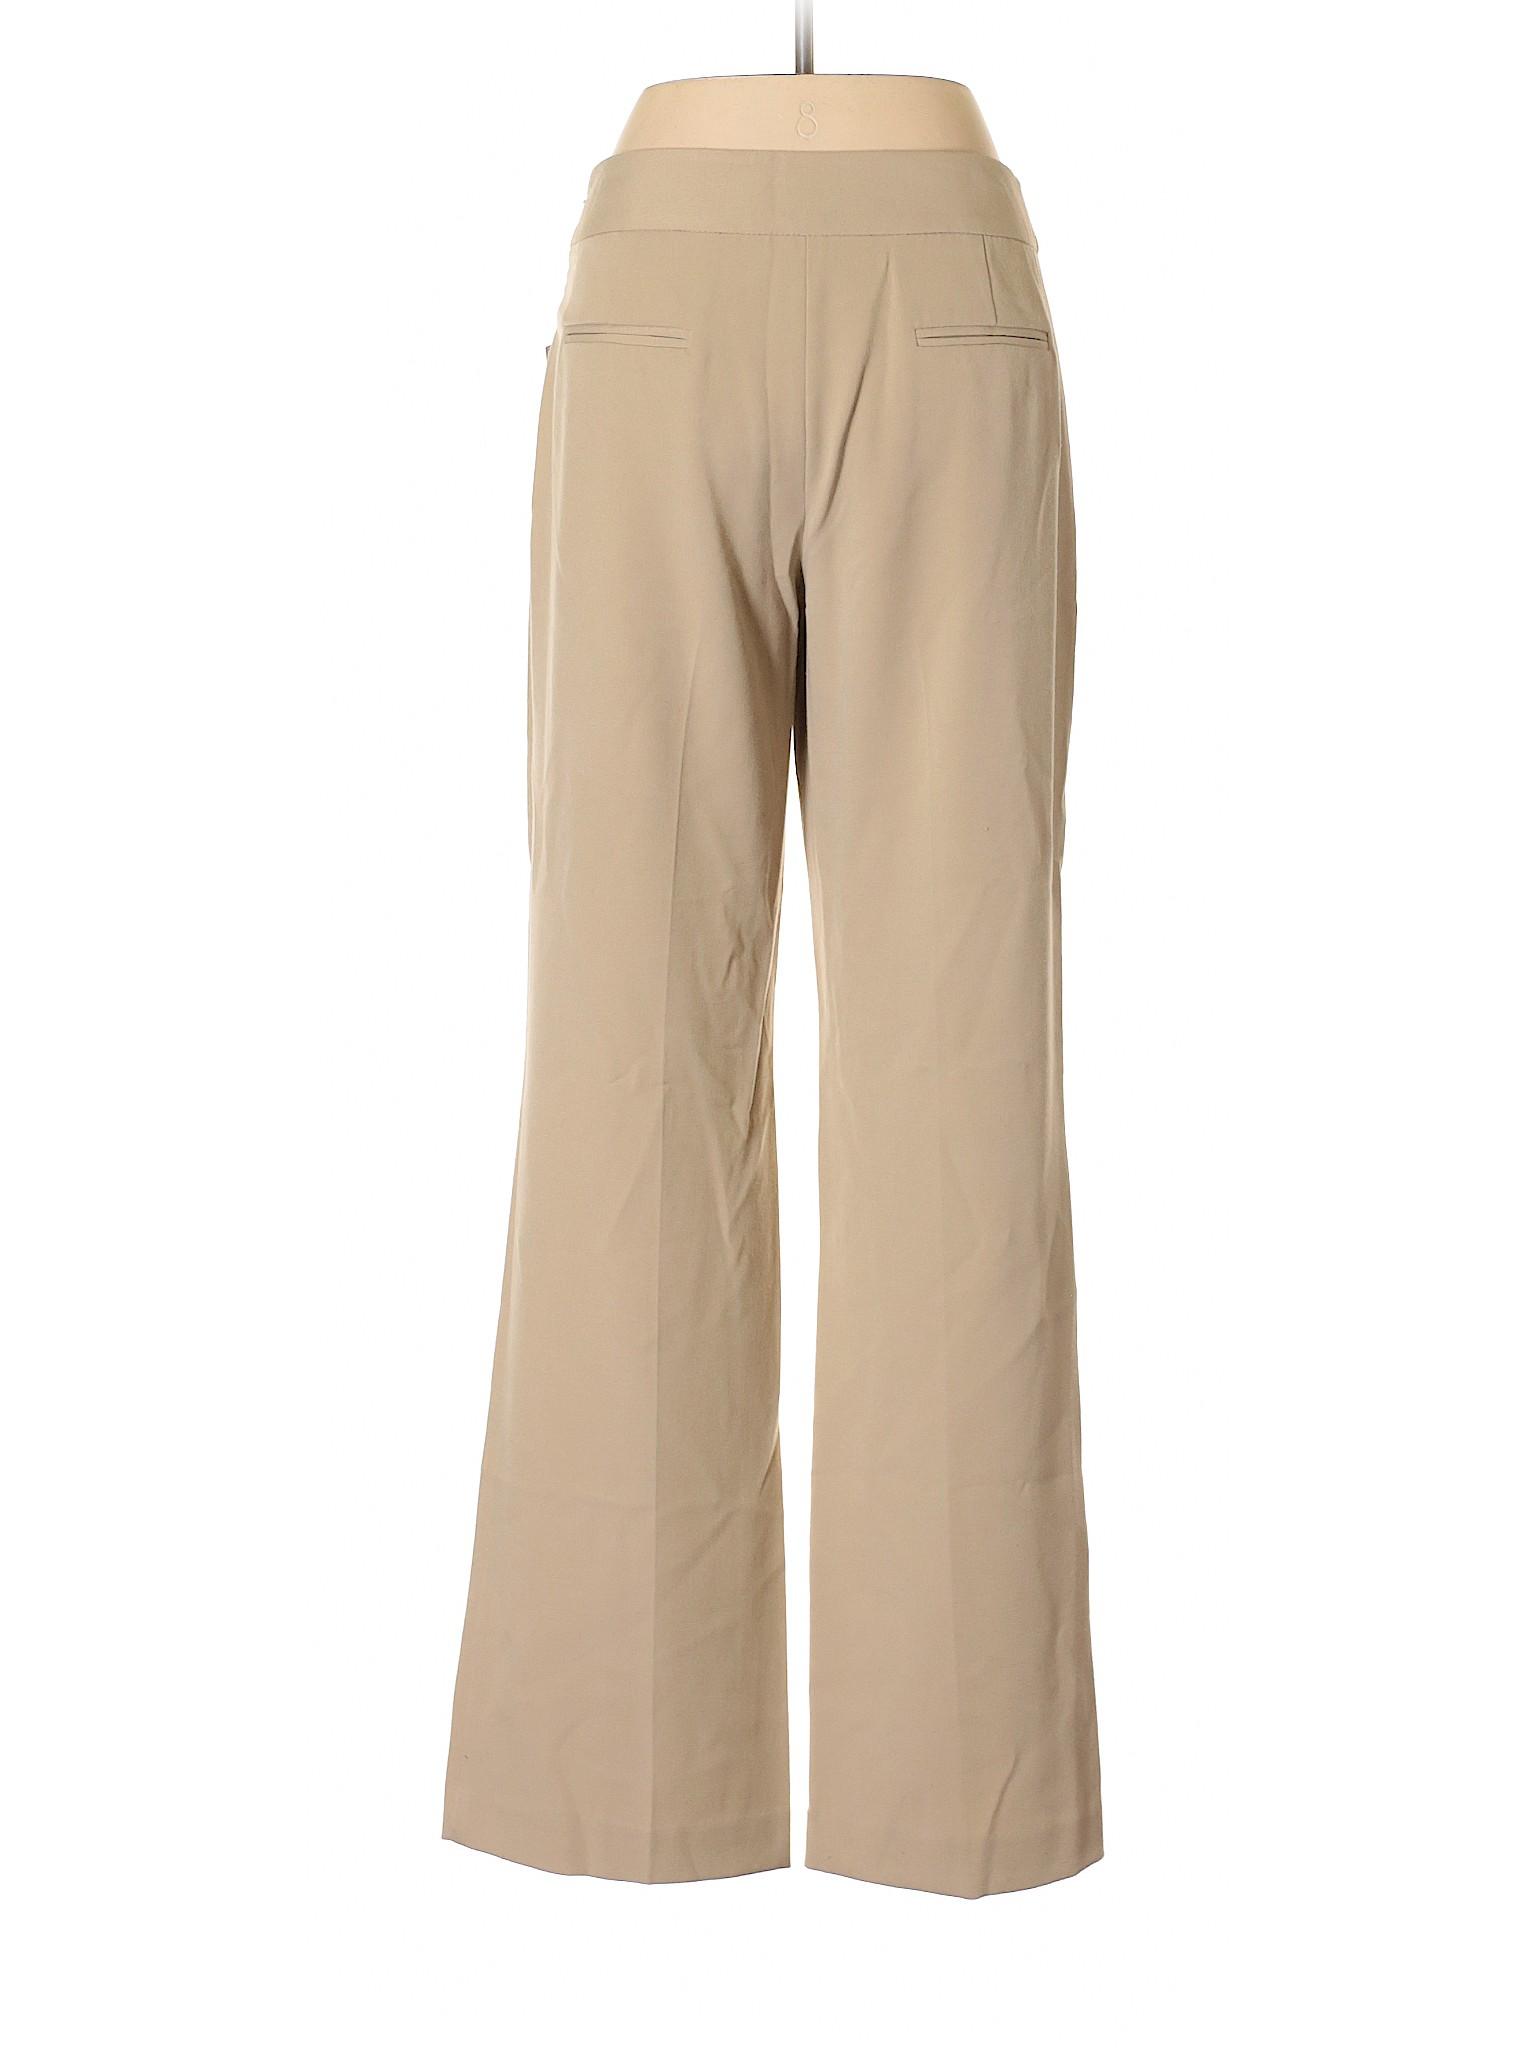 winter Rafaella Pants Boutique Dress winter Rafaella Boutique 8HWRqWpw